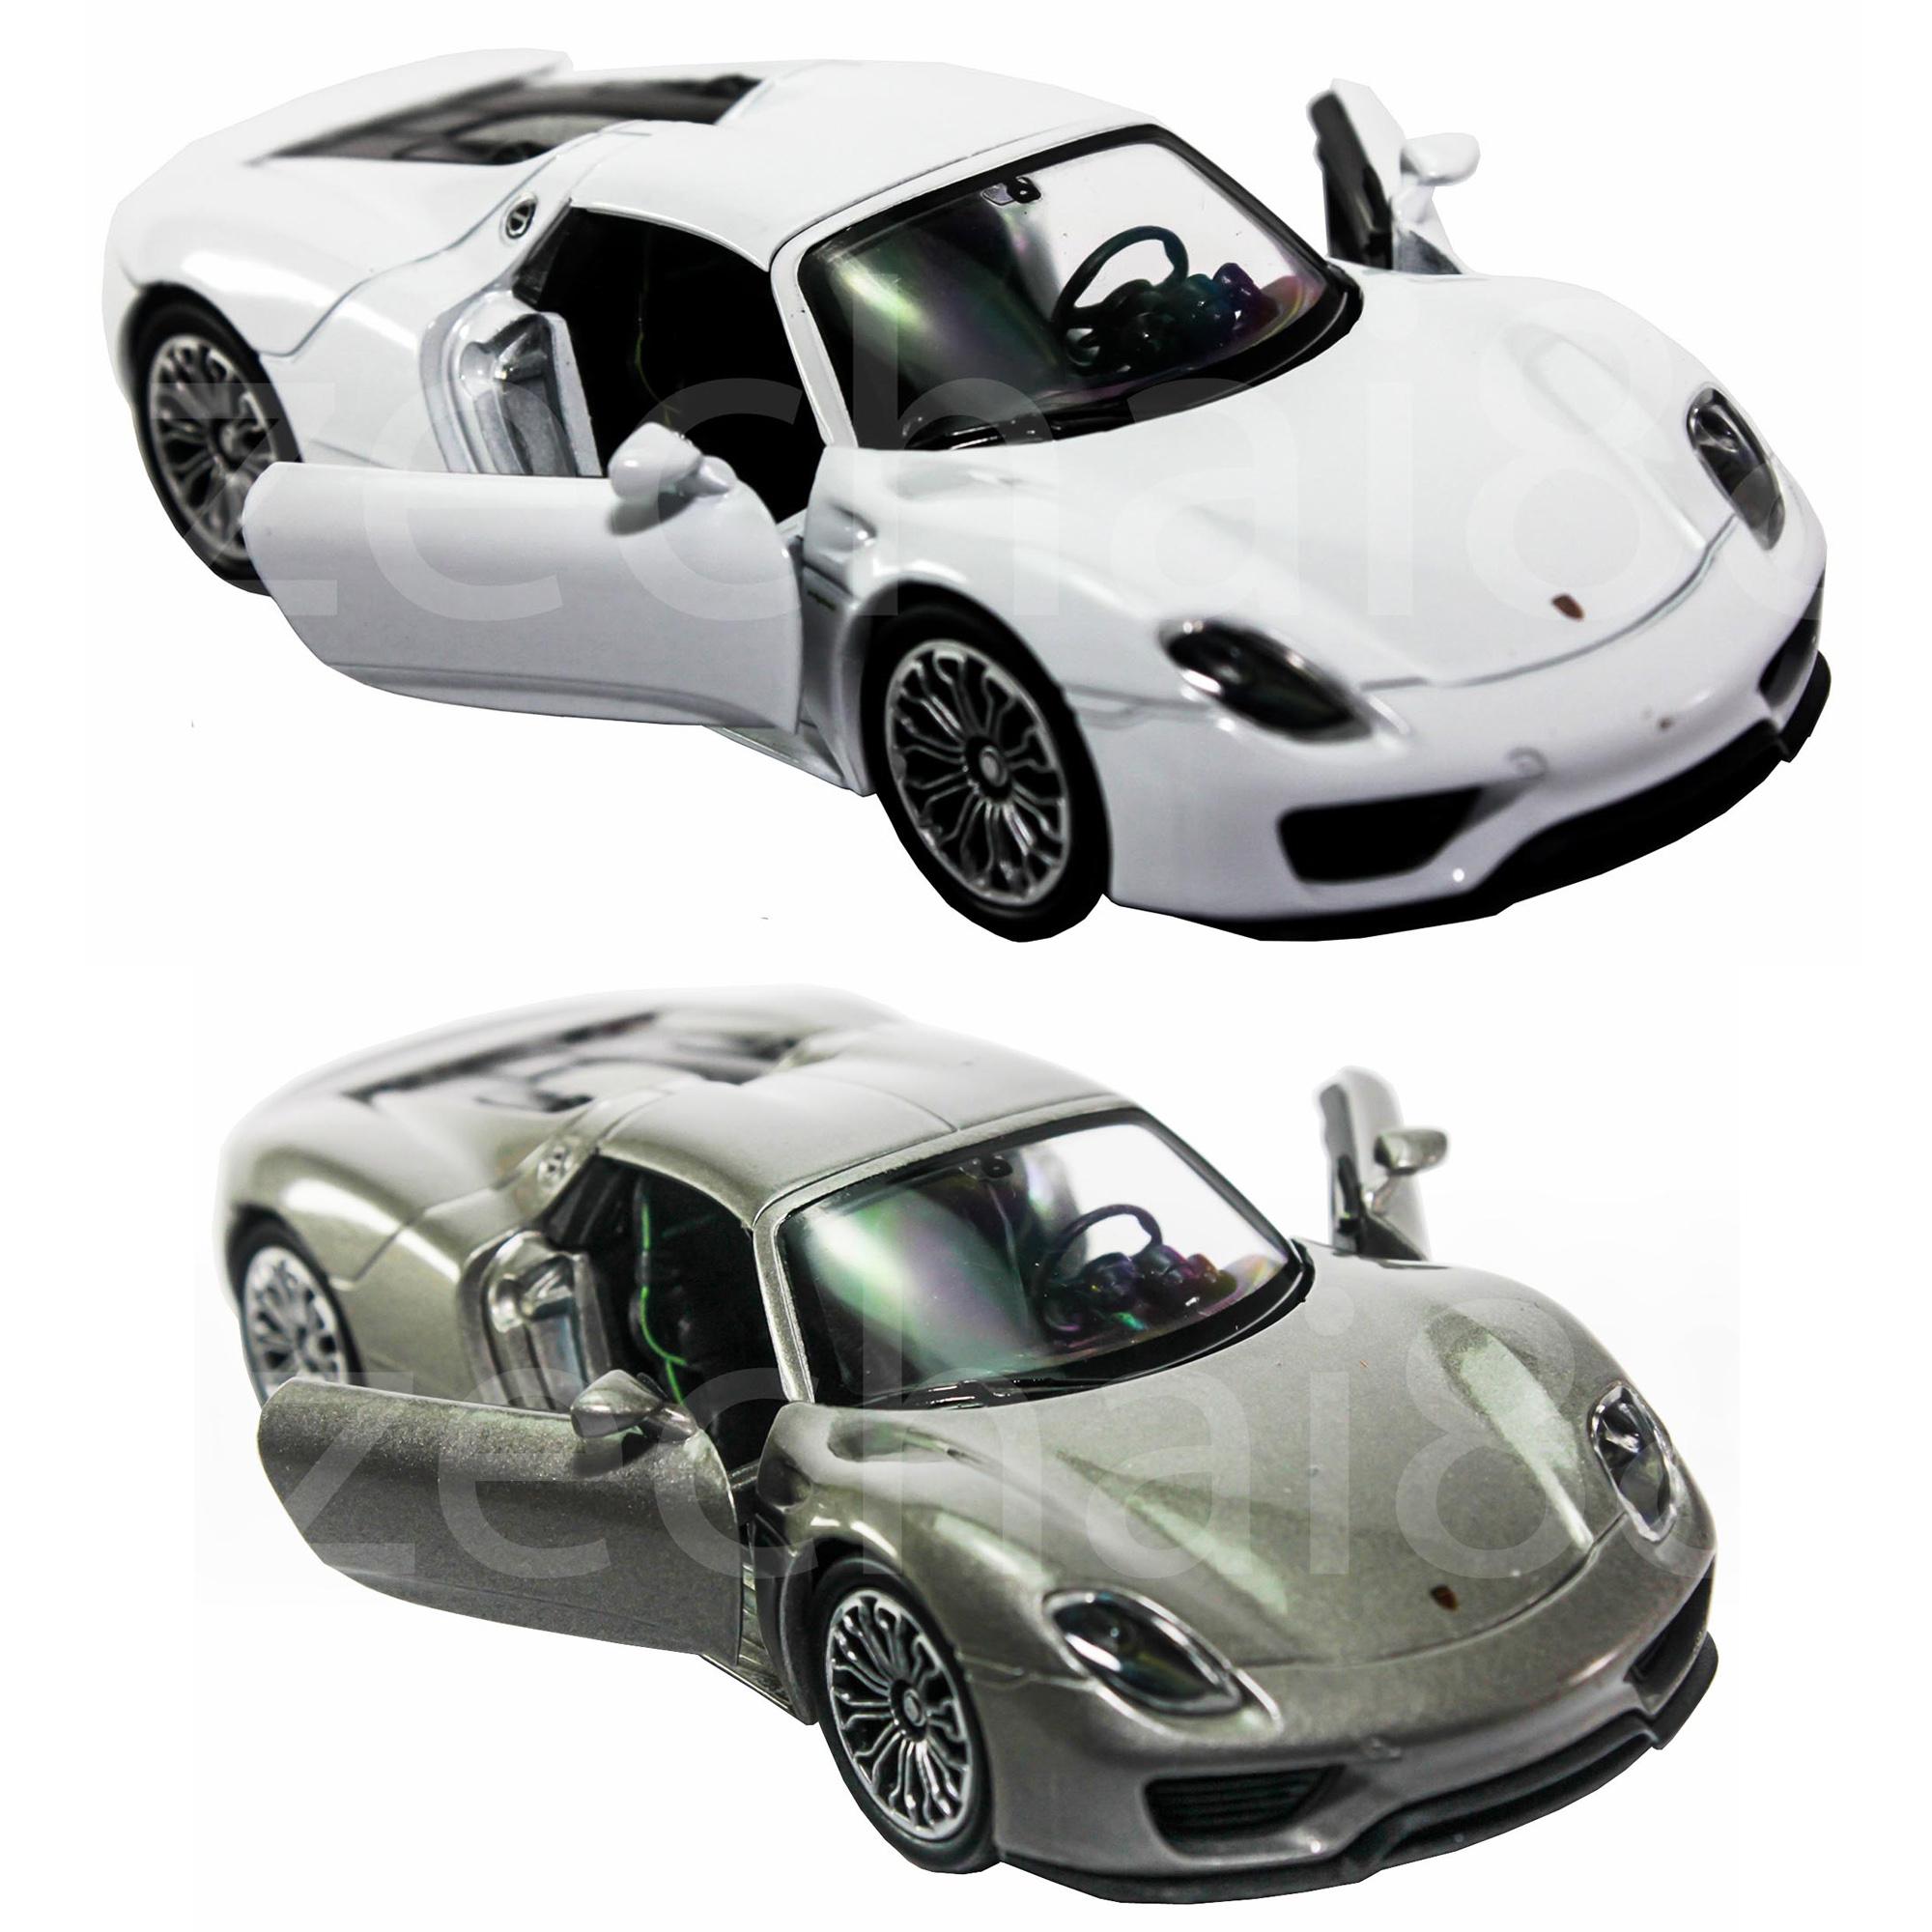 welly-1-34-1-39-die-cast-porsche-918-spyder-car-grey-white-color-model-neo123-1708-25-F247519_1 Amazing Porsche 918 Spyder sold Out Cars Trend